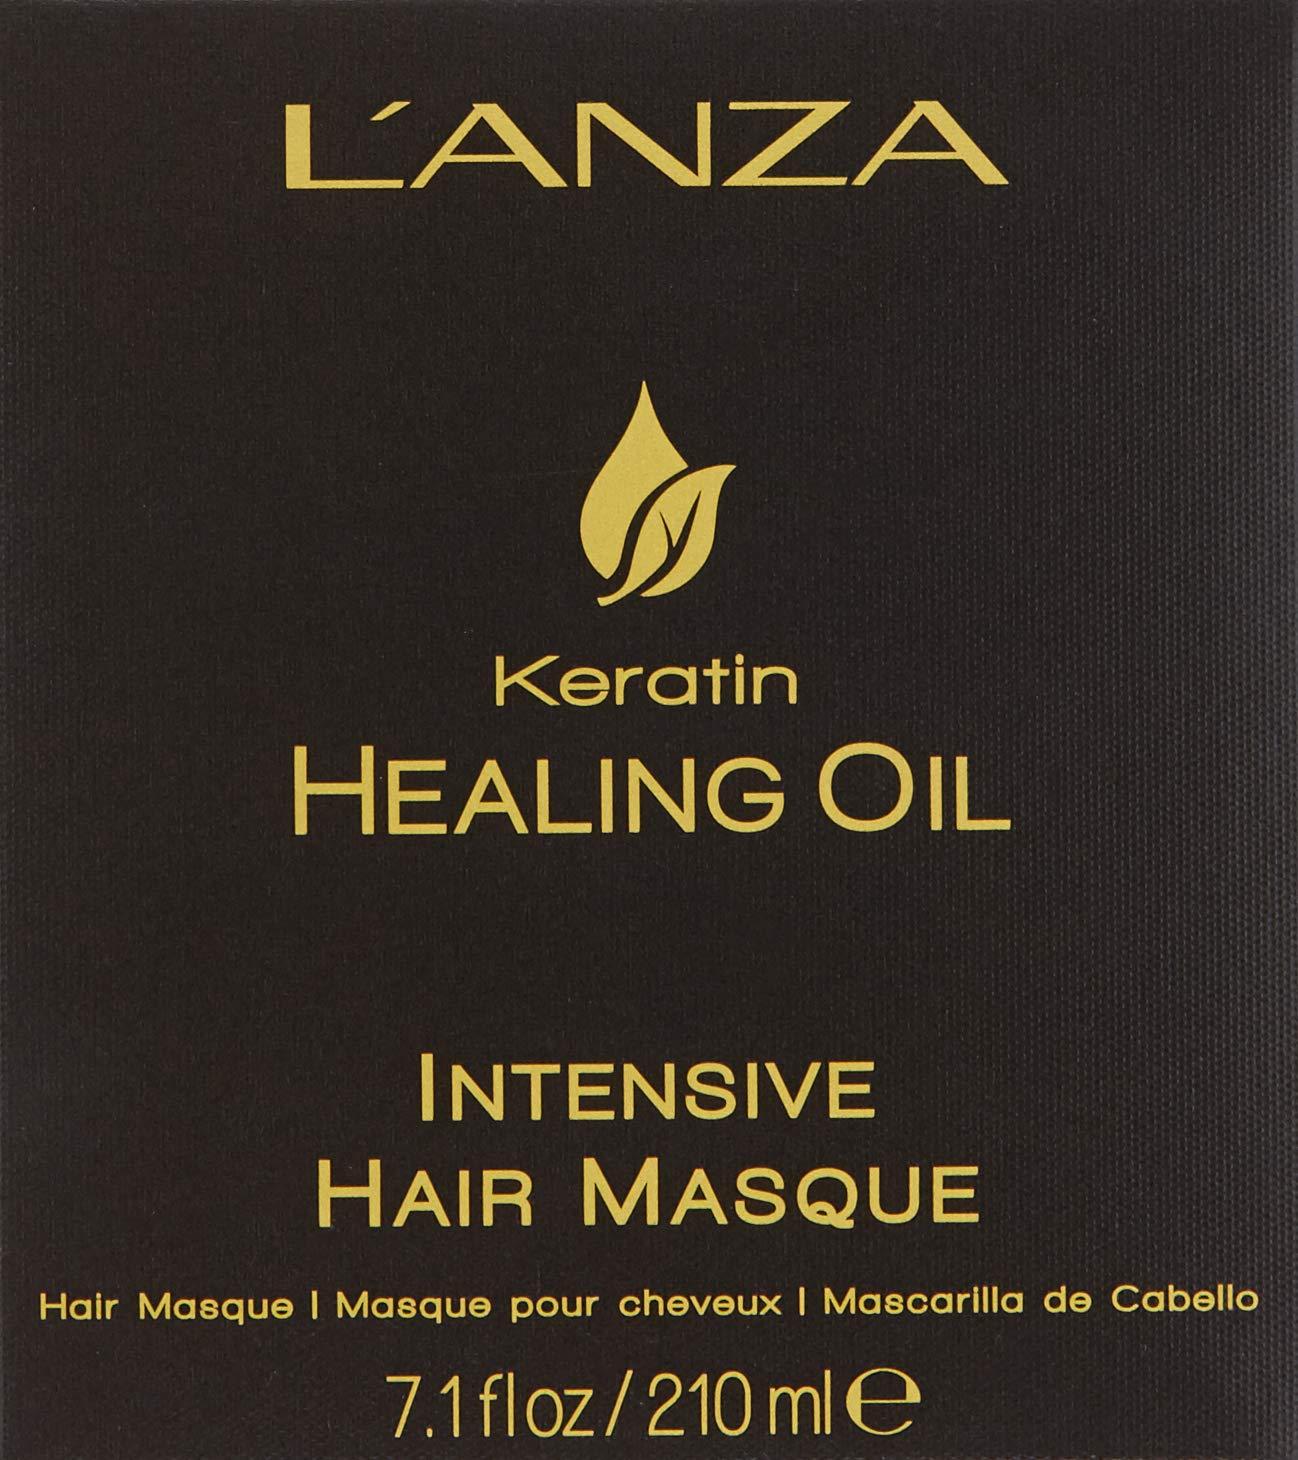 L'ANZA Keratin Healing Oil Intensive Hair Masque, 7.1 oz. by L'ANZA (Image #4)